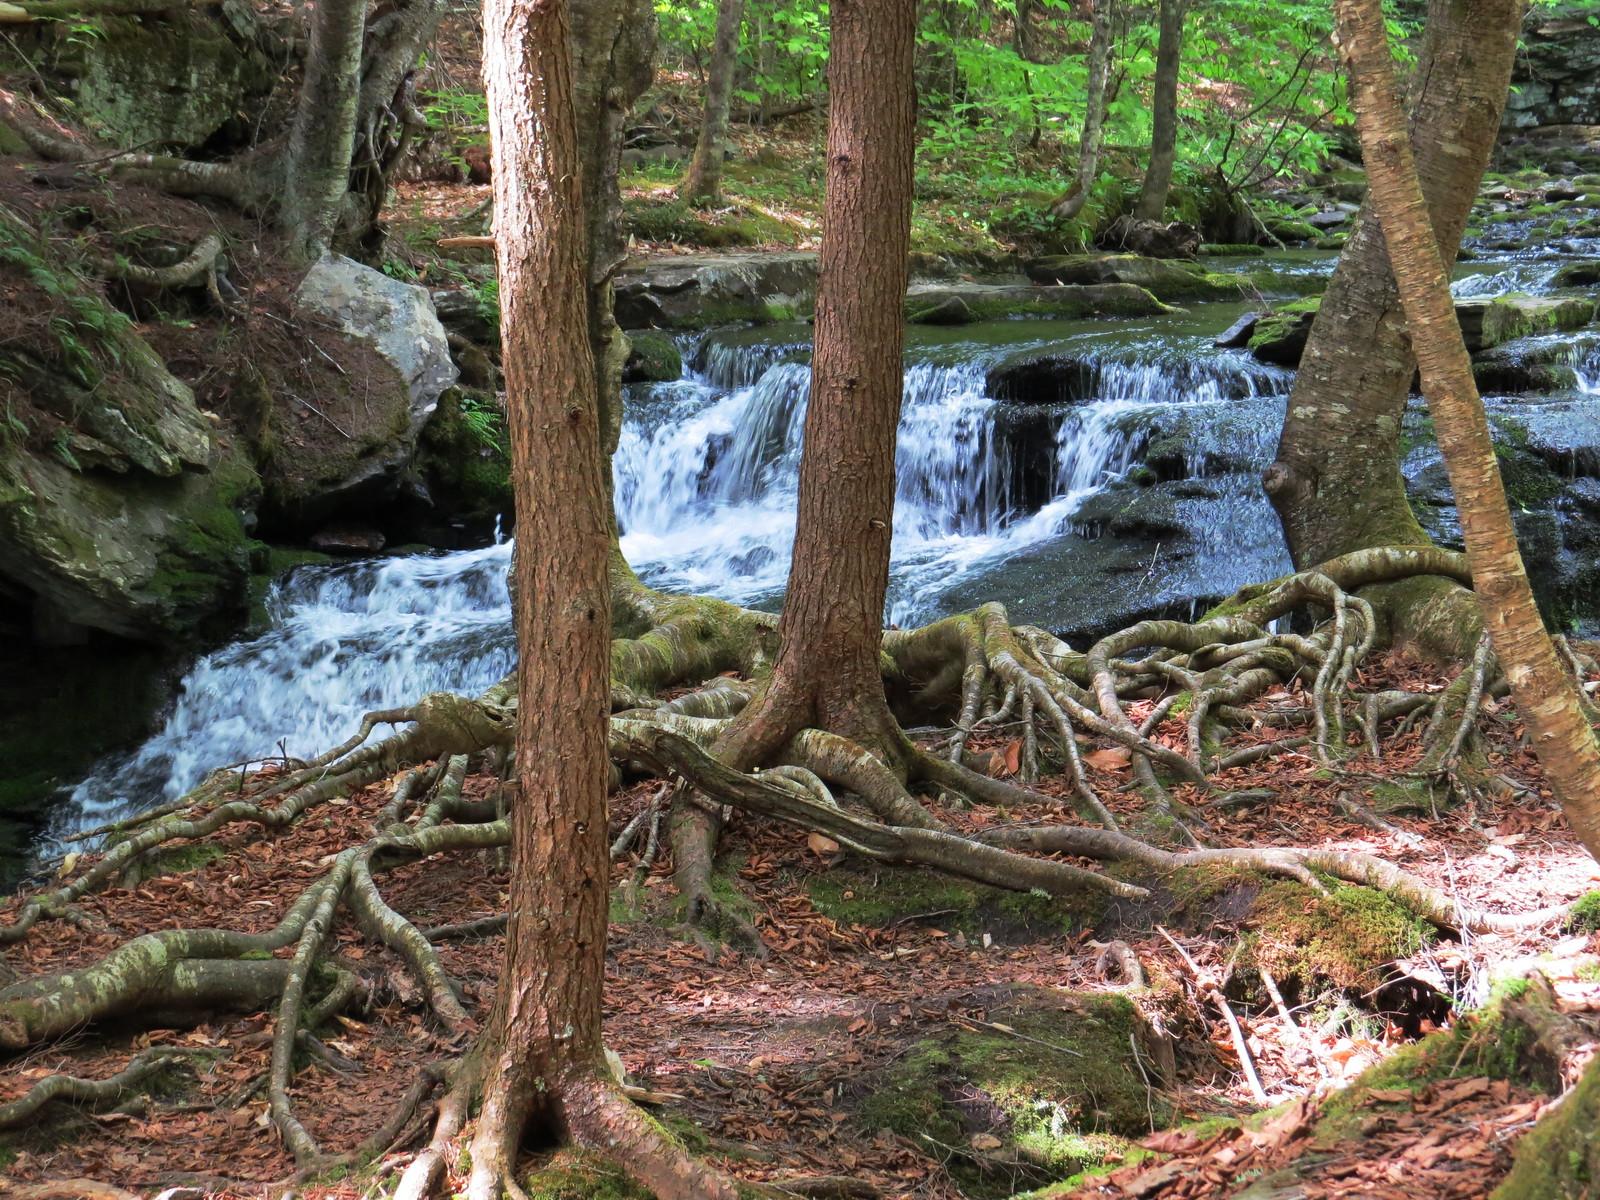 Willowemoc Wild Forest, Catskills, NY